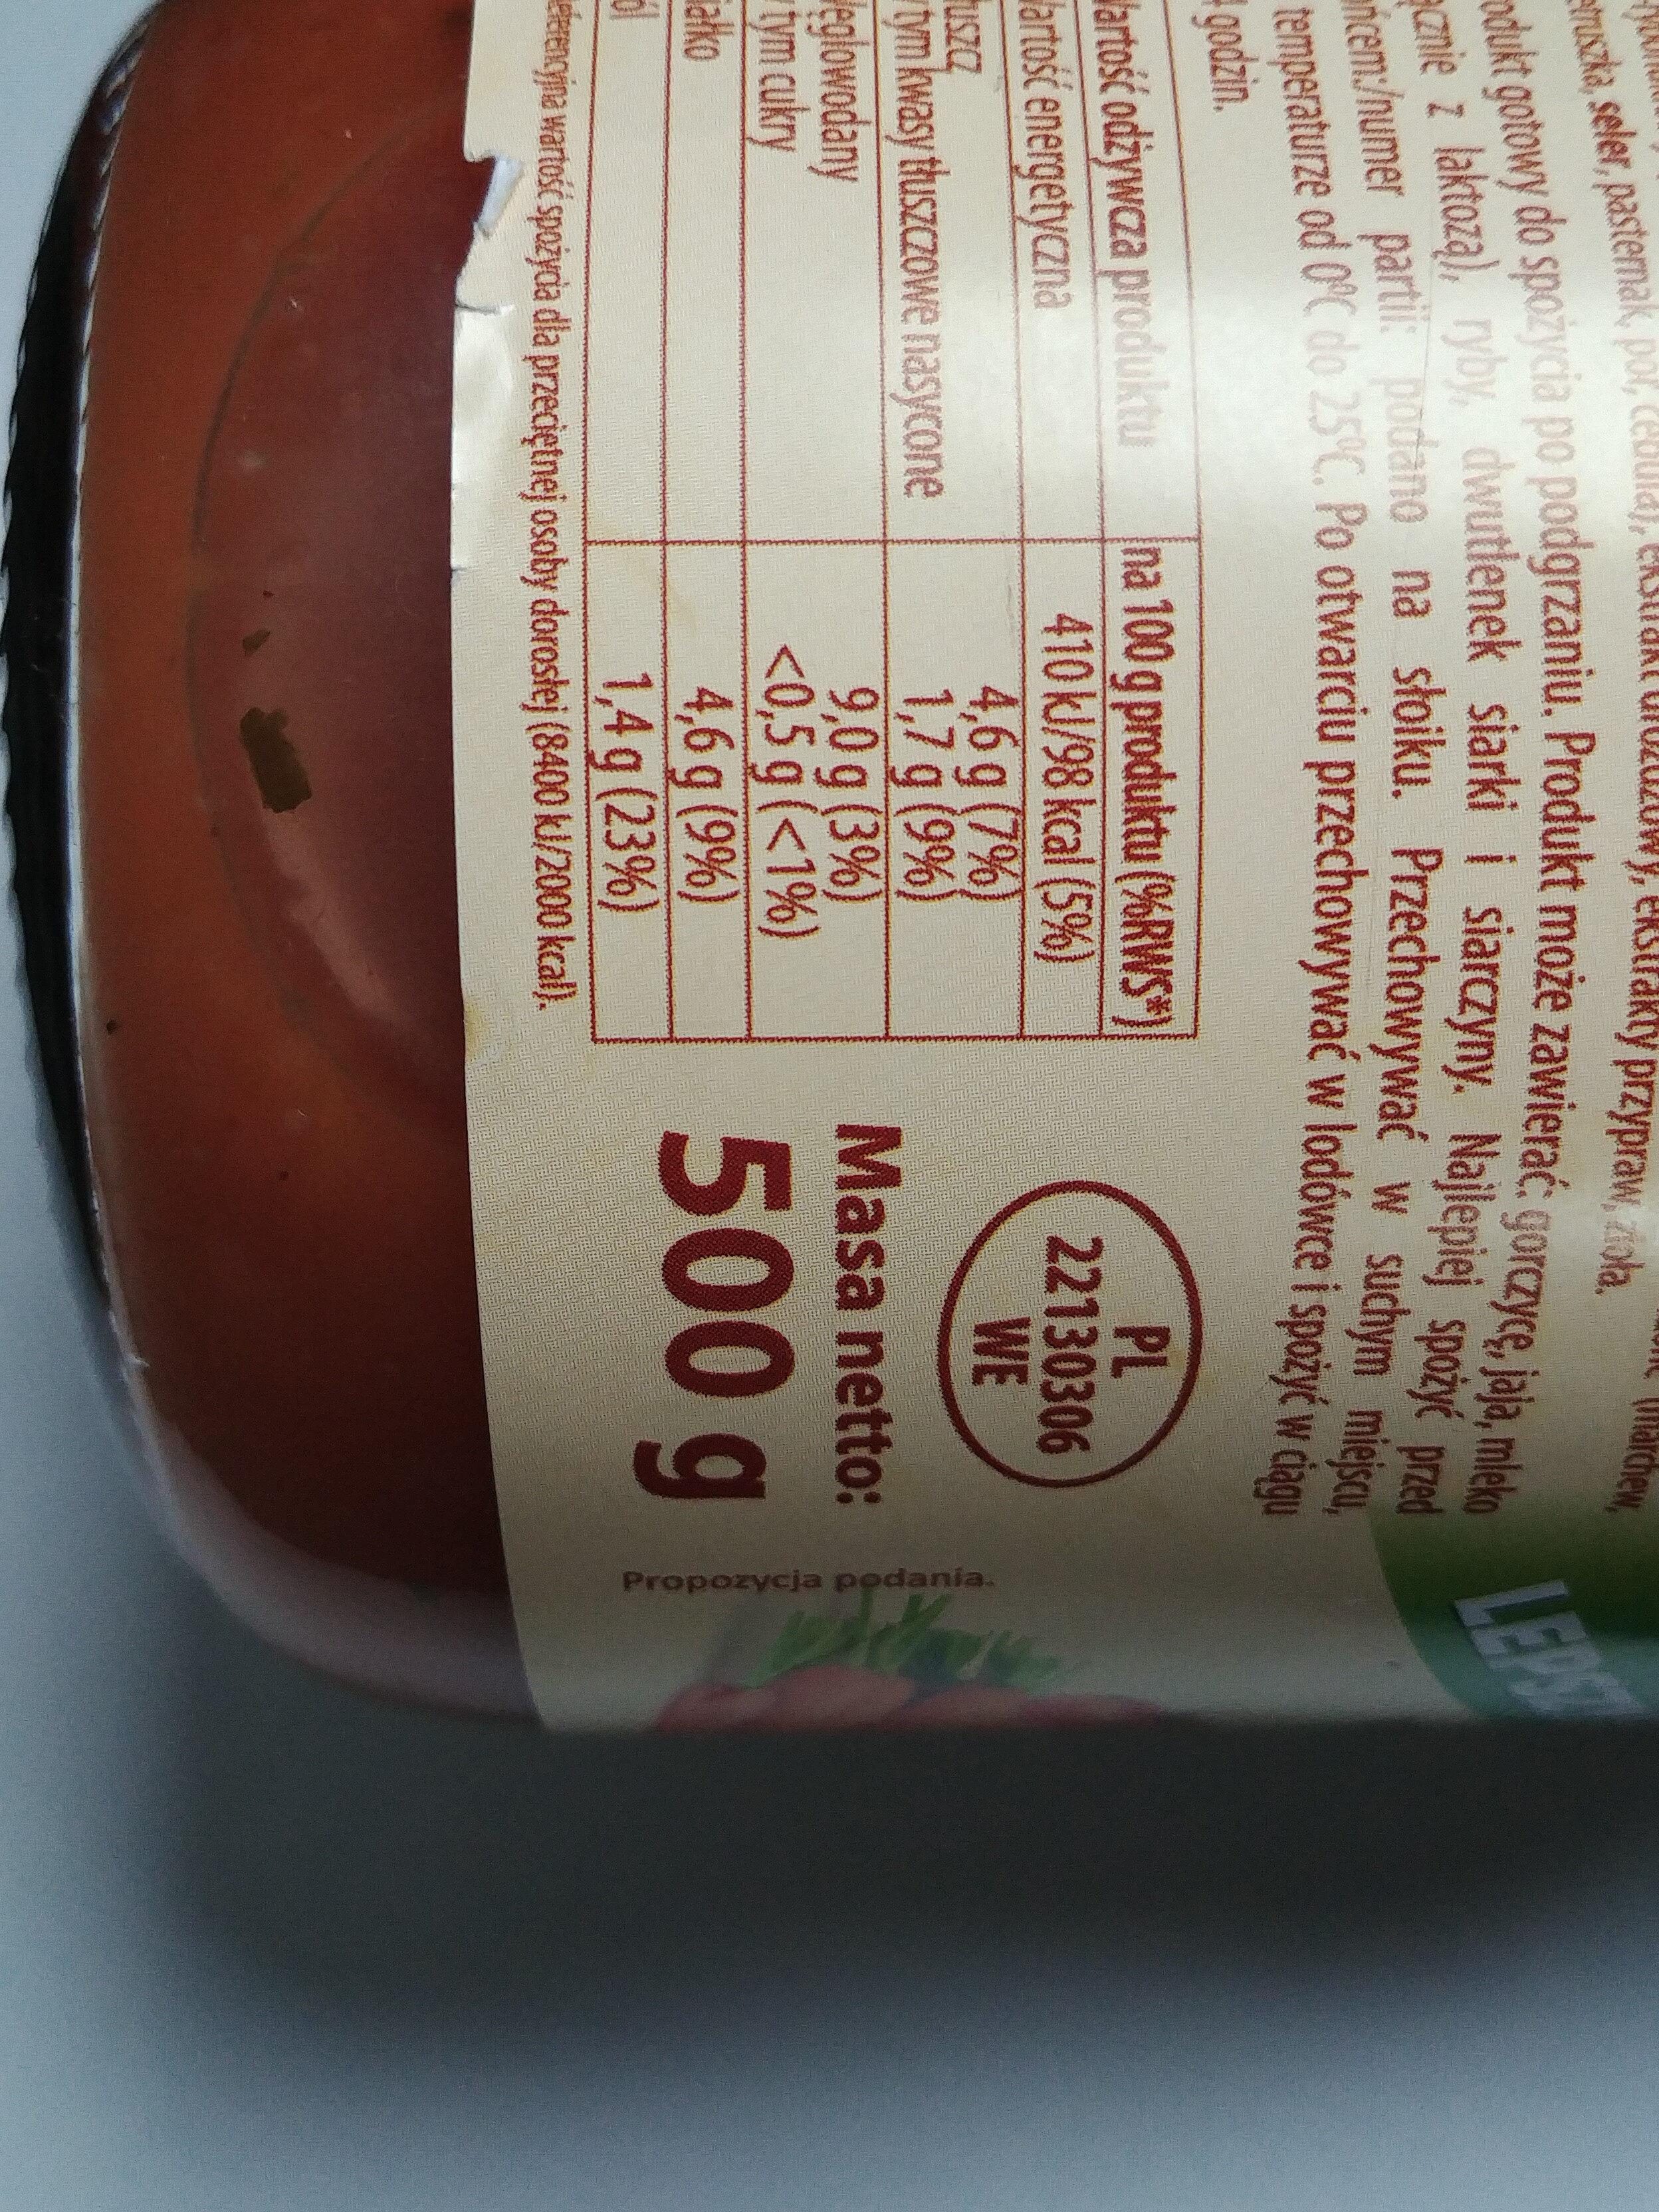 Pulpety drobiowe w sosie pomidorowym - Informations nutritionnelles